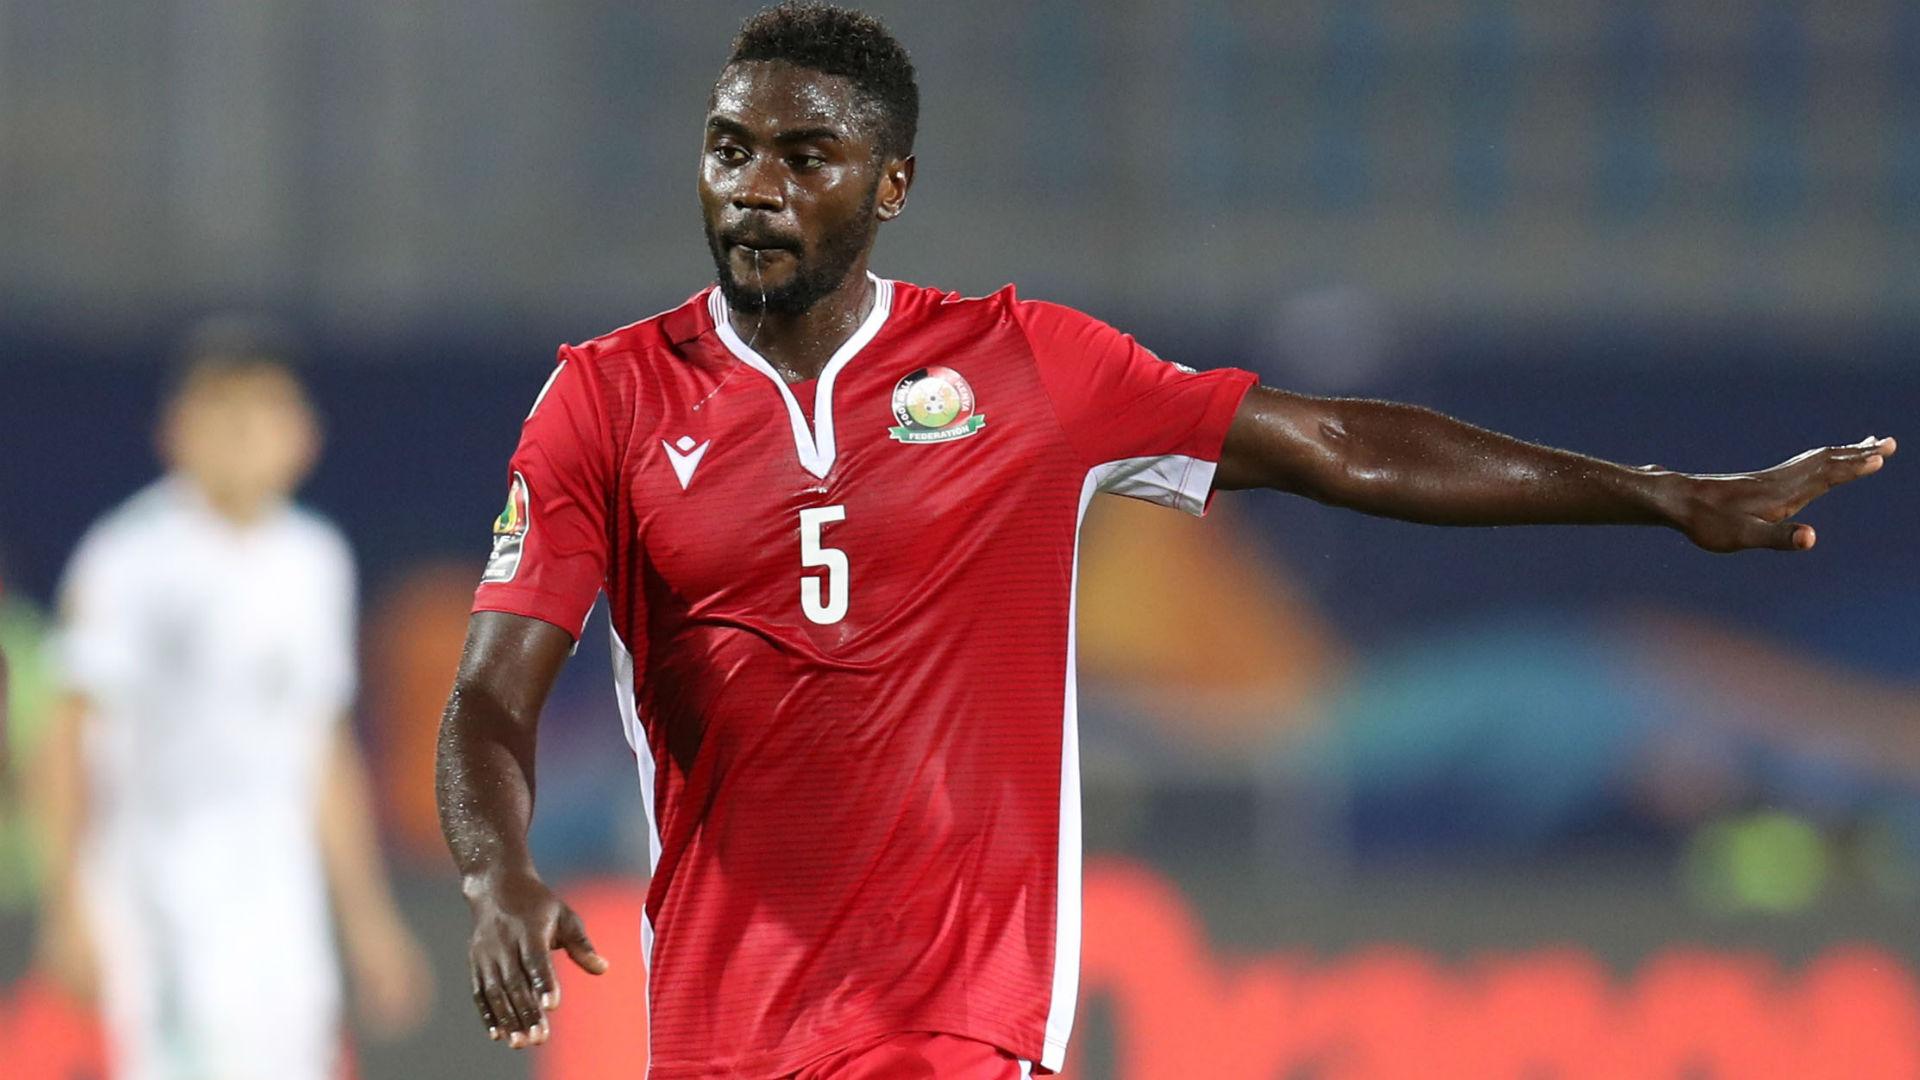 KPL Transfers: Sofapaka keen to engage free agent Musa Mohammed – Kalekwa